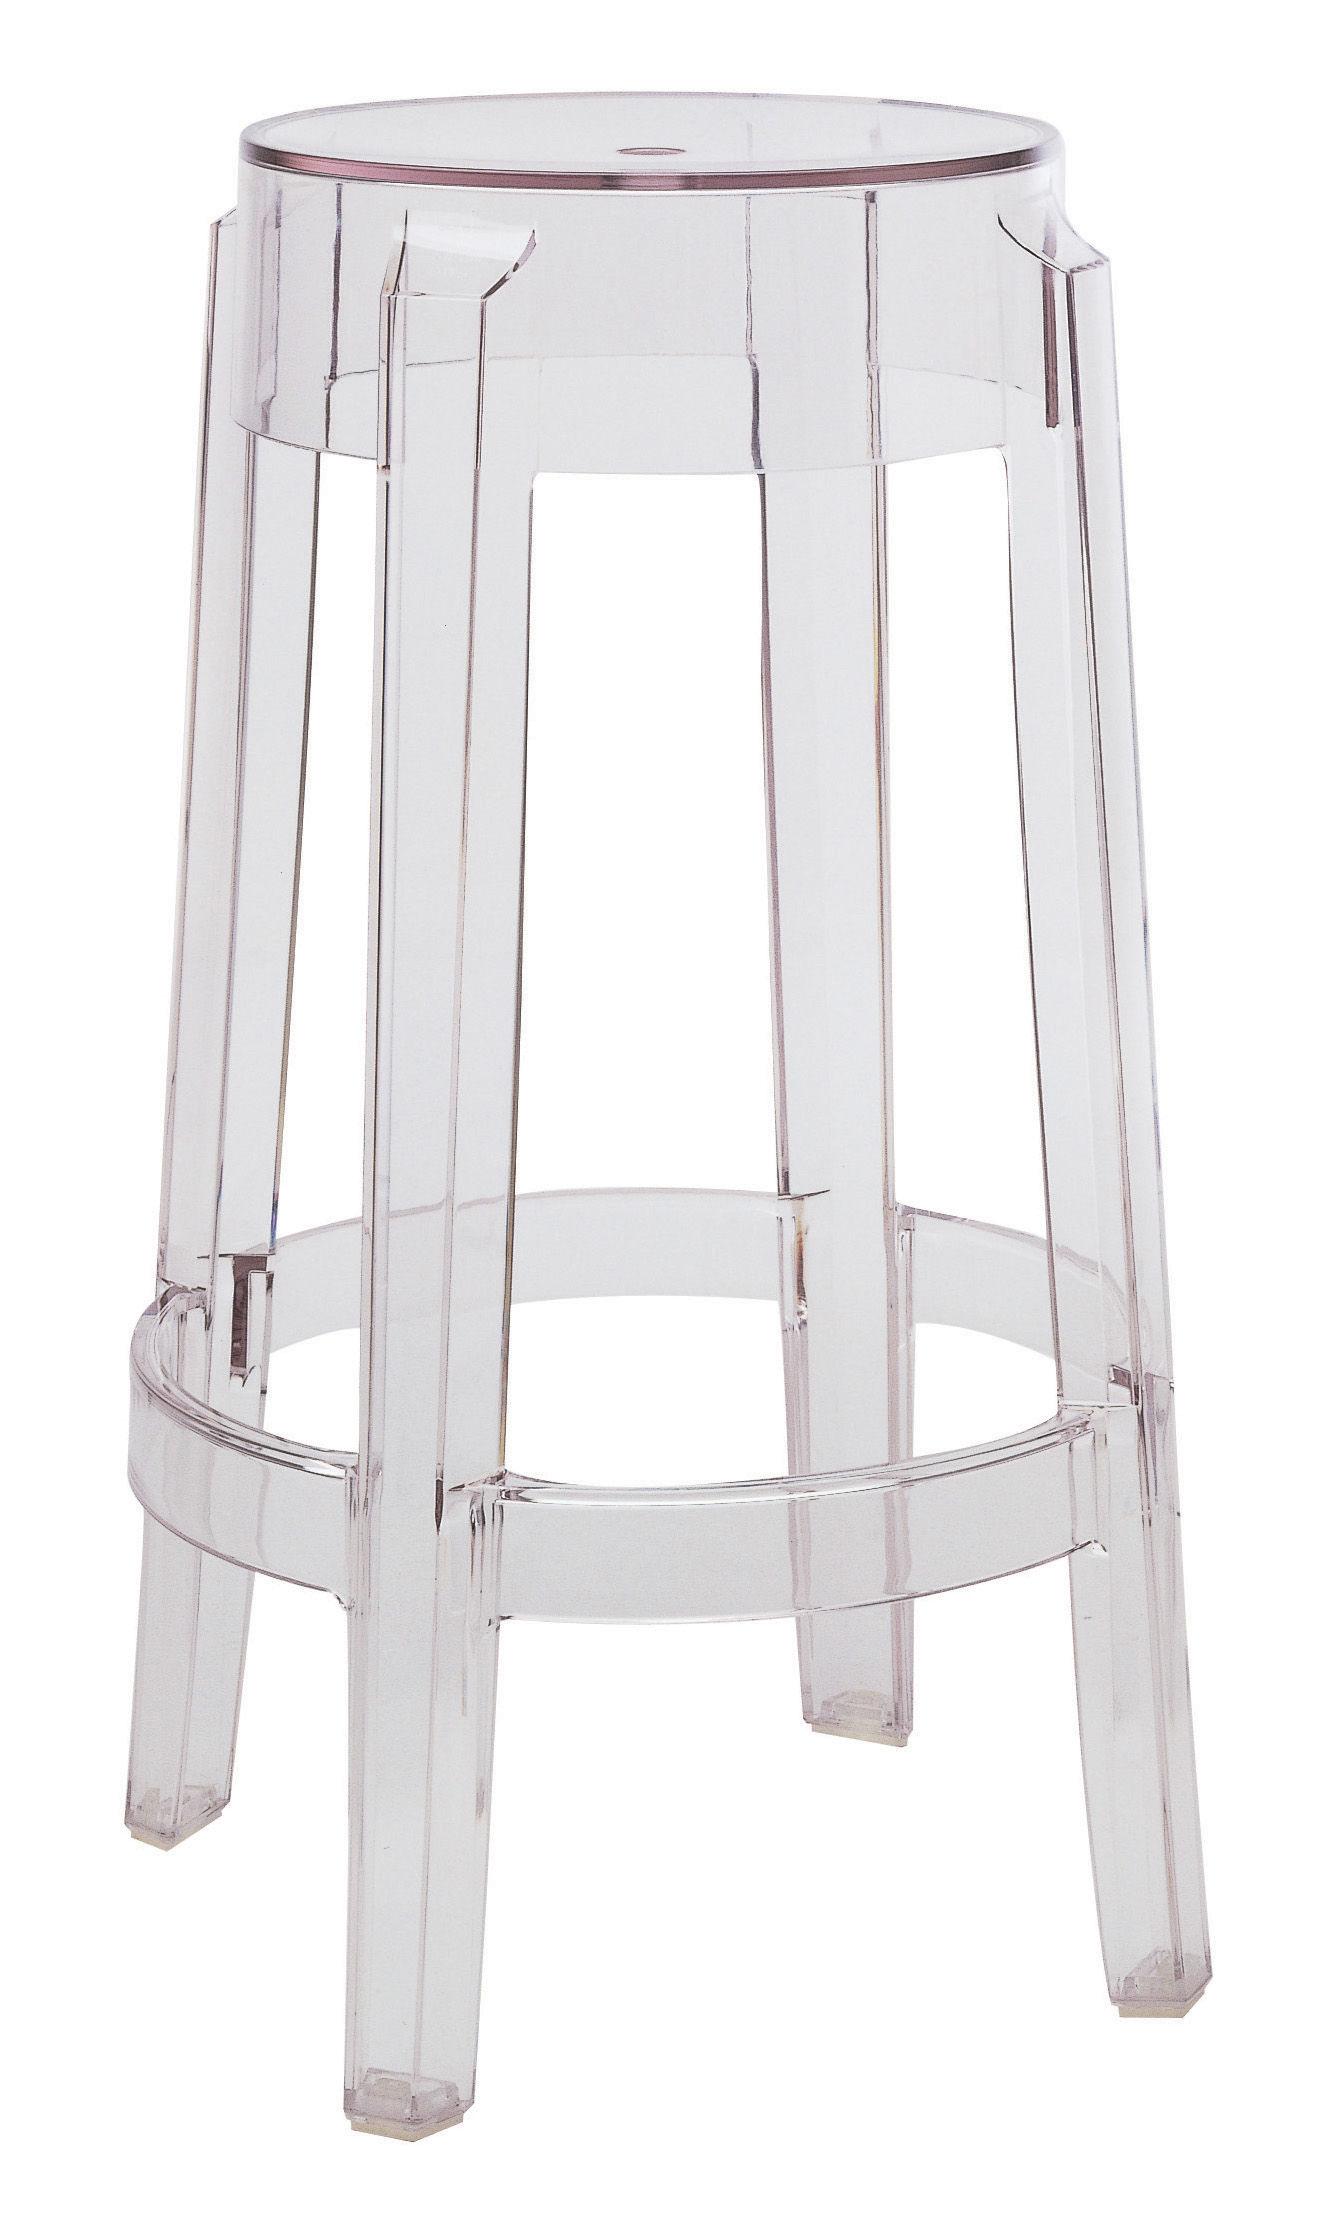 Mobilier - Tabourets de bar - Tabouret haut empilable Charles Ghost / H 65 cm - Plastique - Kartell - Cristal - Polycarbonate